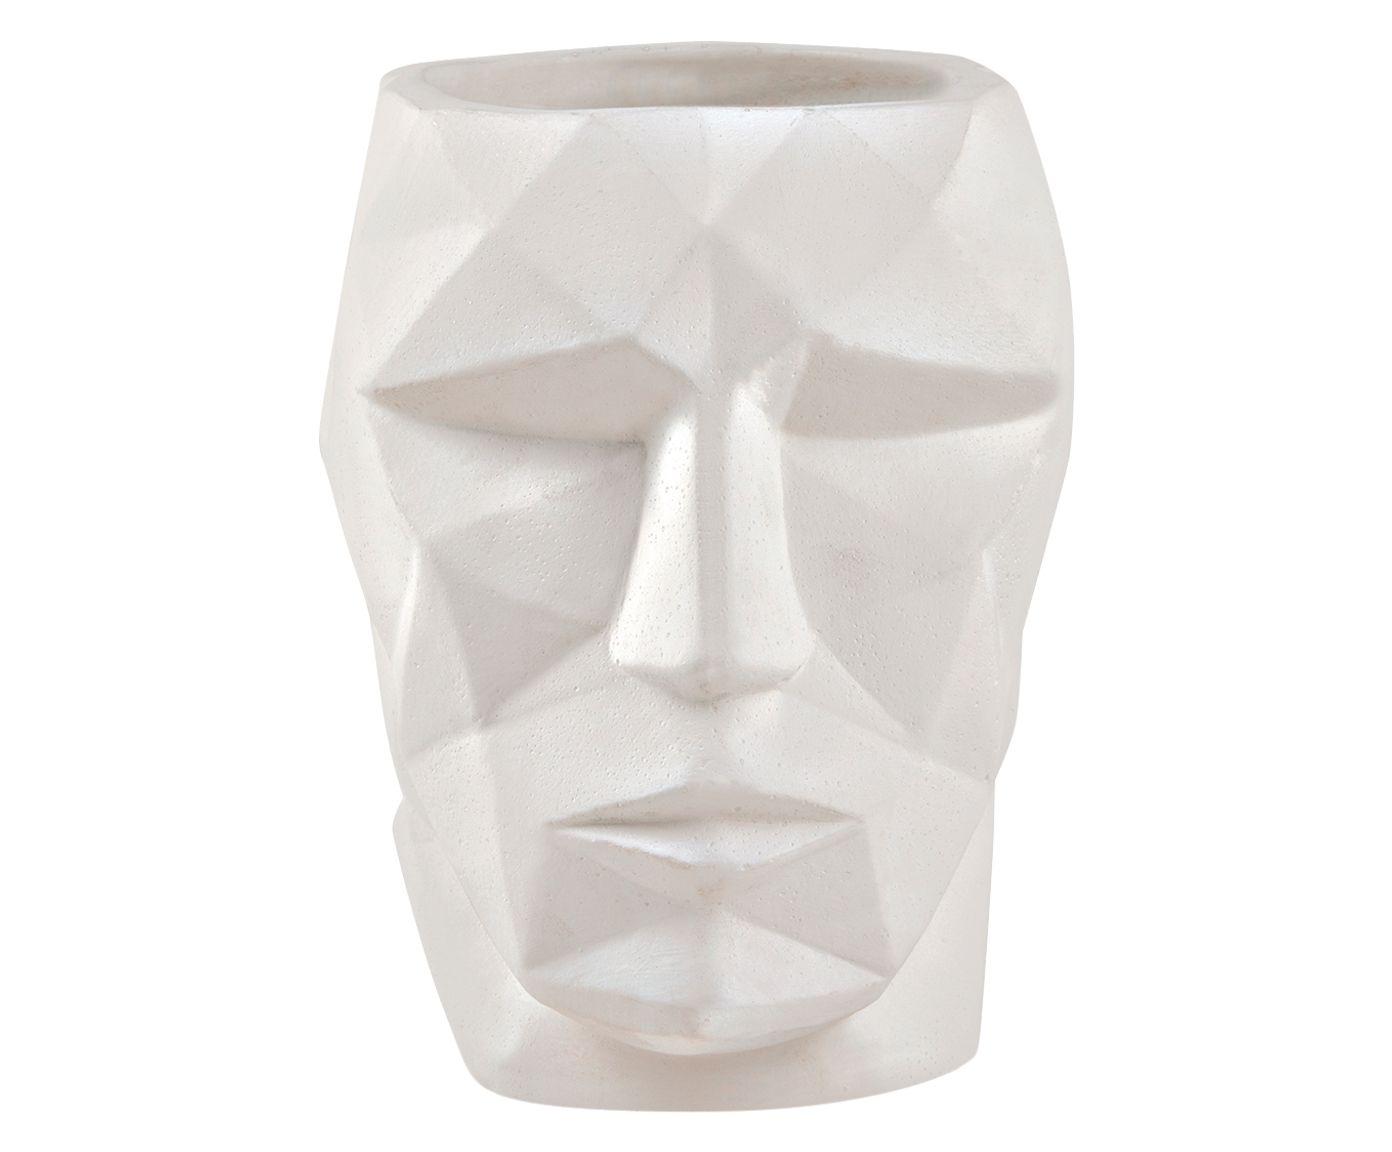 Cachepot Corin Branco - 16X12X16cm | Westwing.com.br